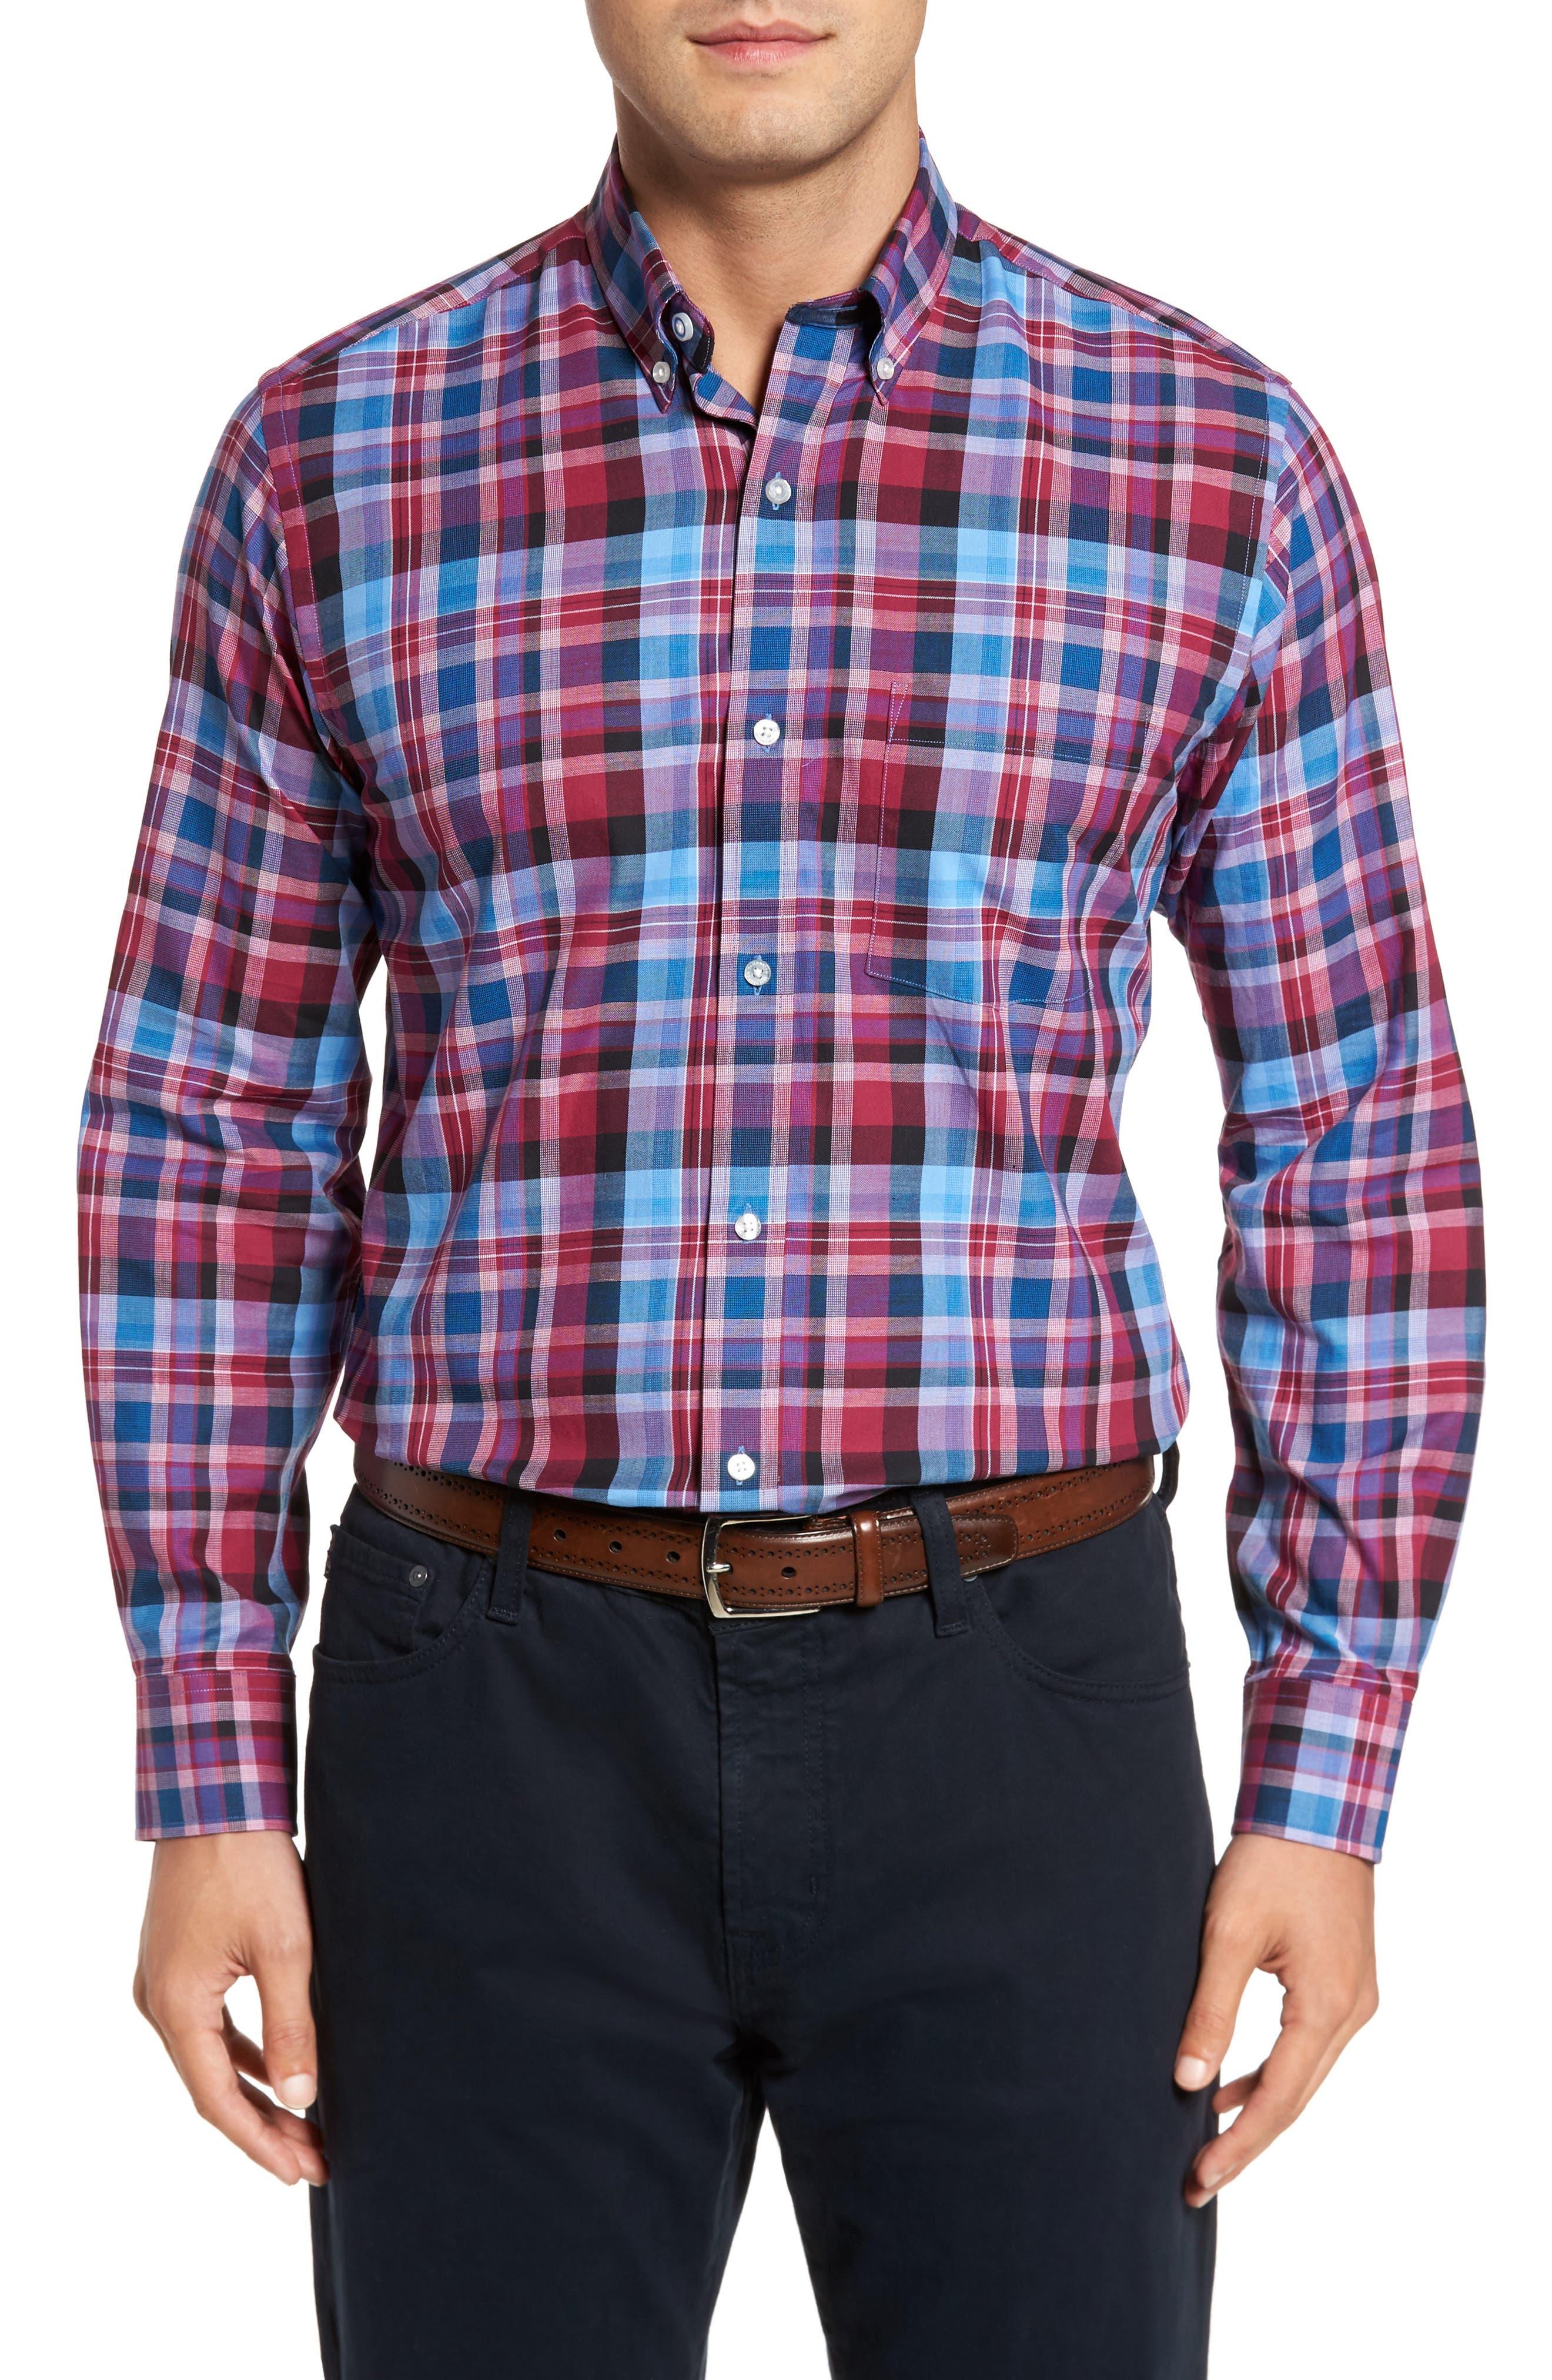 Main Image - TailorByrd Colfax Plaid Sport Shirt